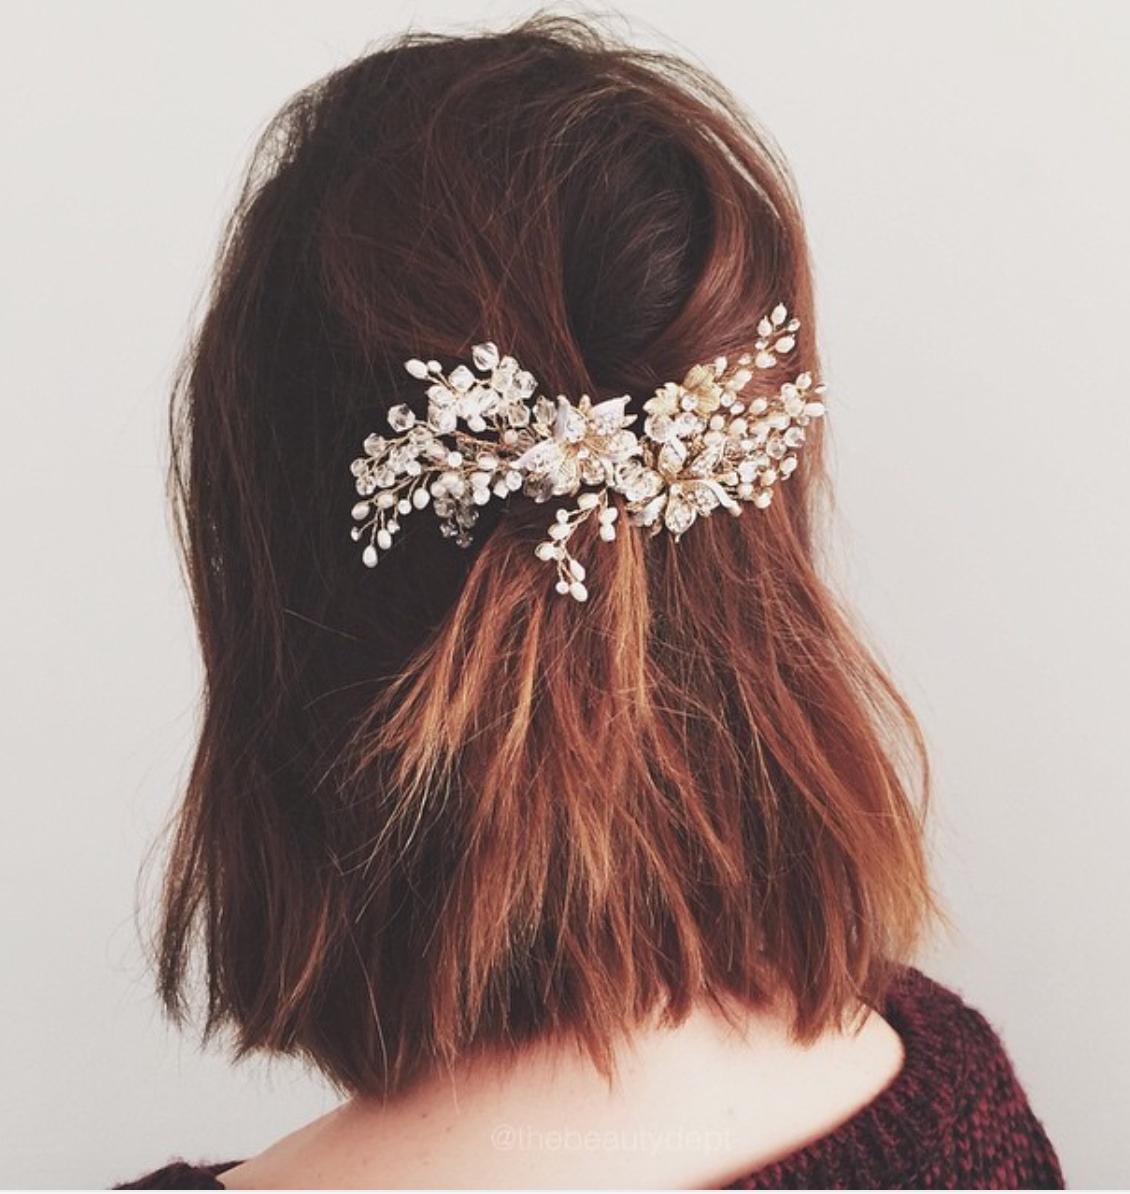 Hair by Kristen Ess